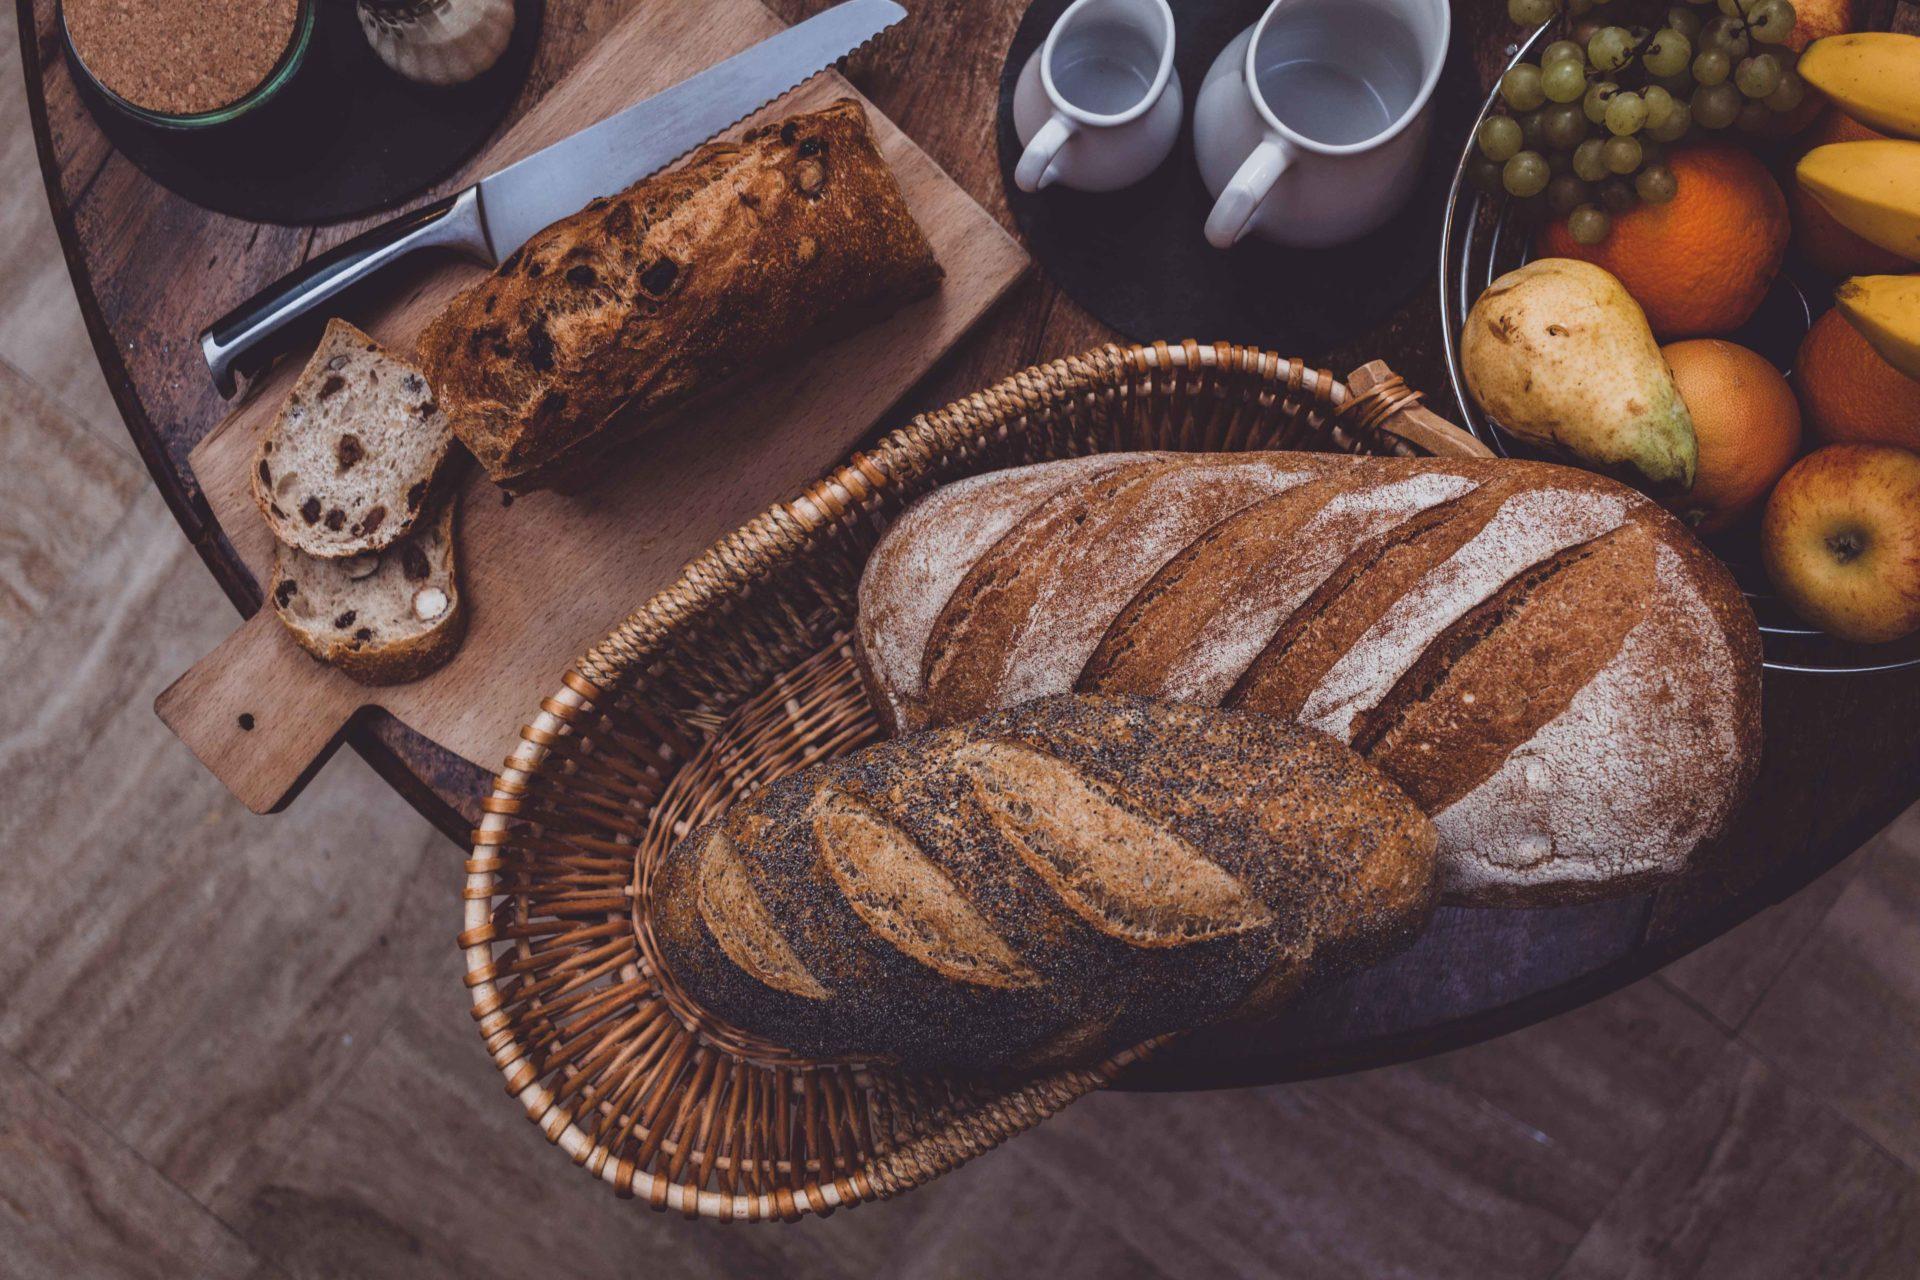 culinaire-photographe-culinaire-photographe lourdes-tarbes-pau-justeat-deliveroo-restaurant-fastfood